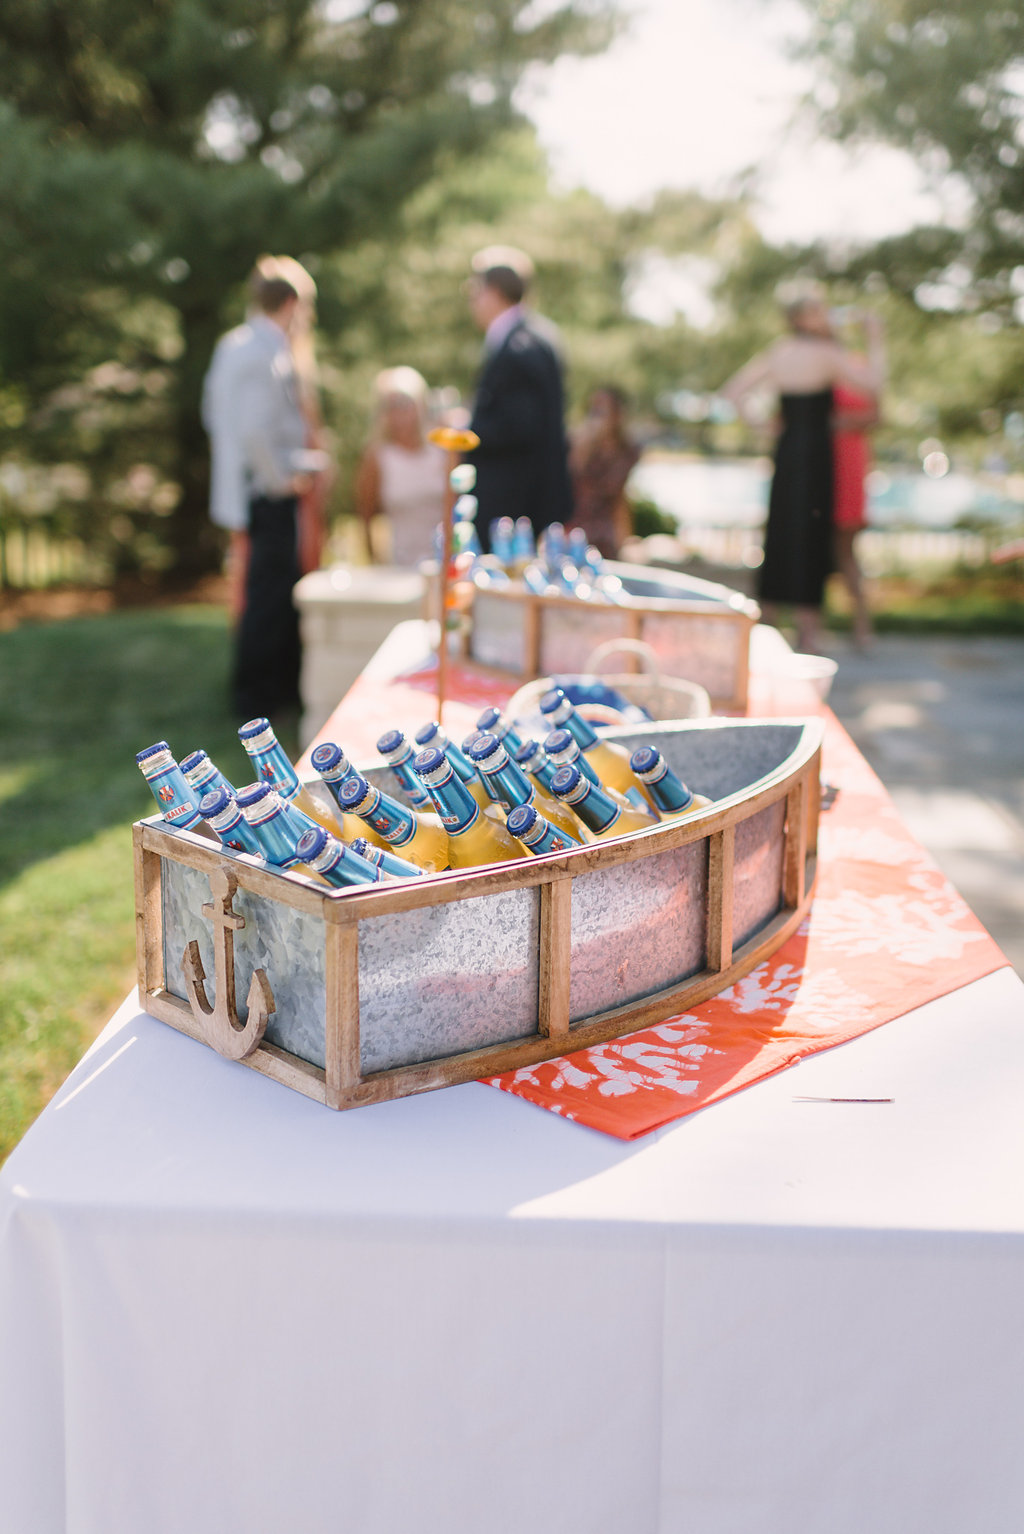 Cameron-Powel-Wes-Mize-wedding-20160618-430.jpg